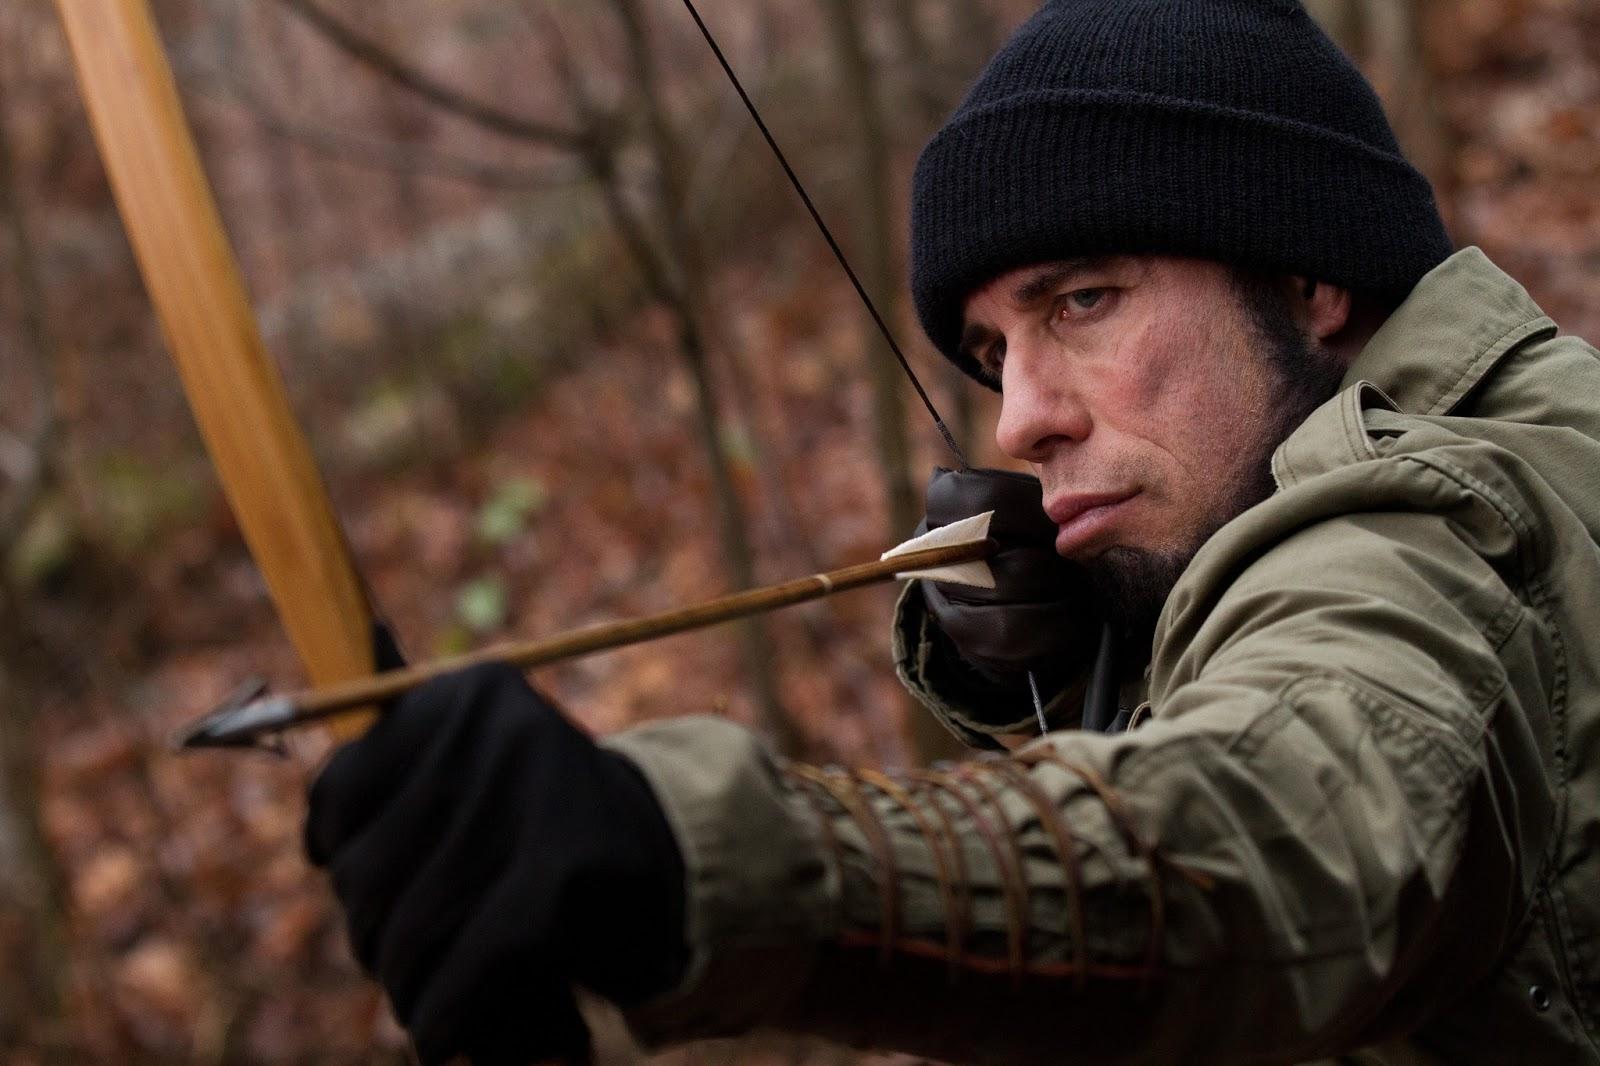 video review : Killing Season